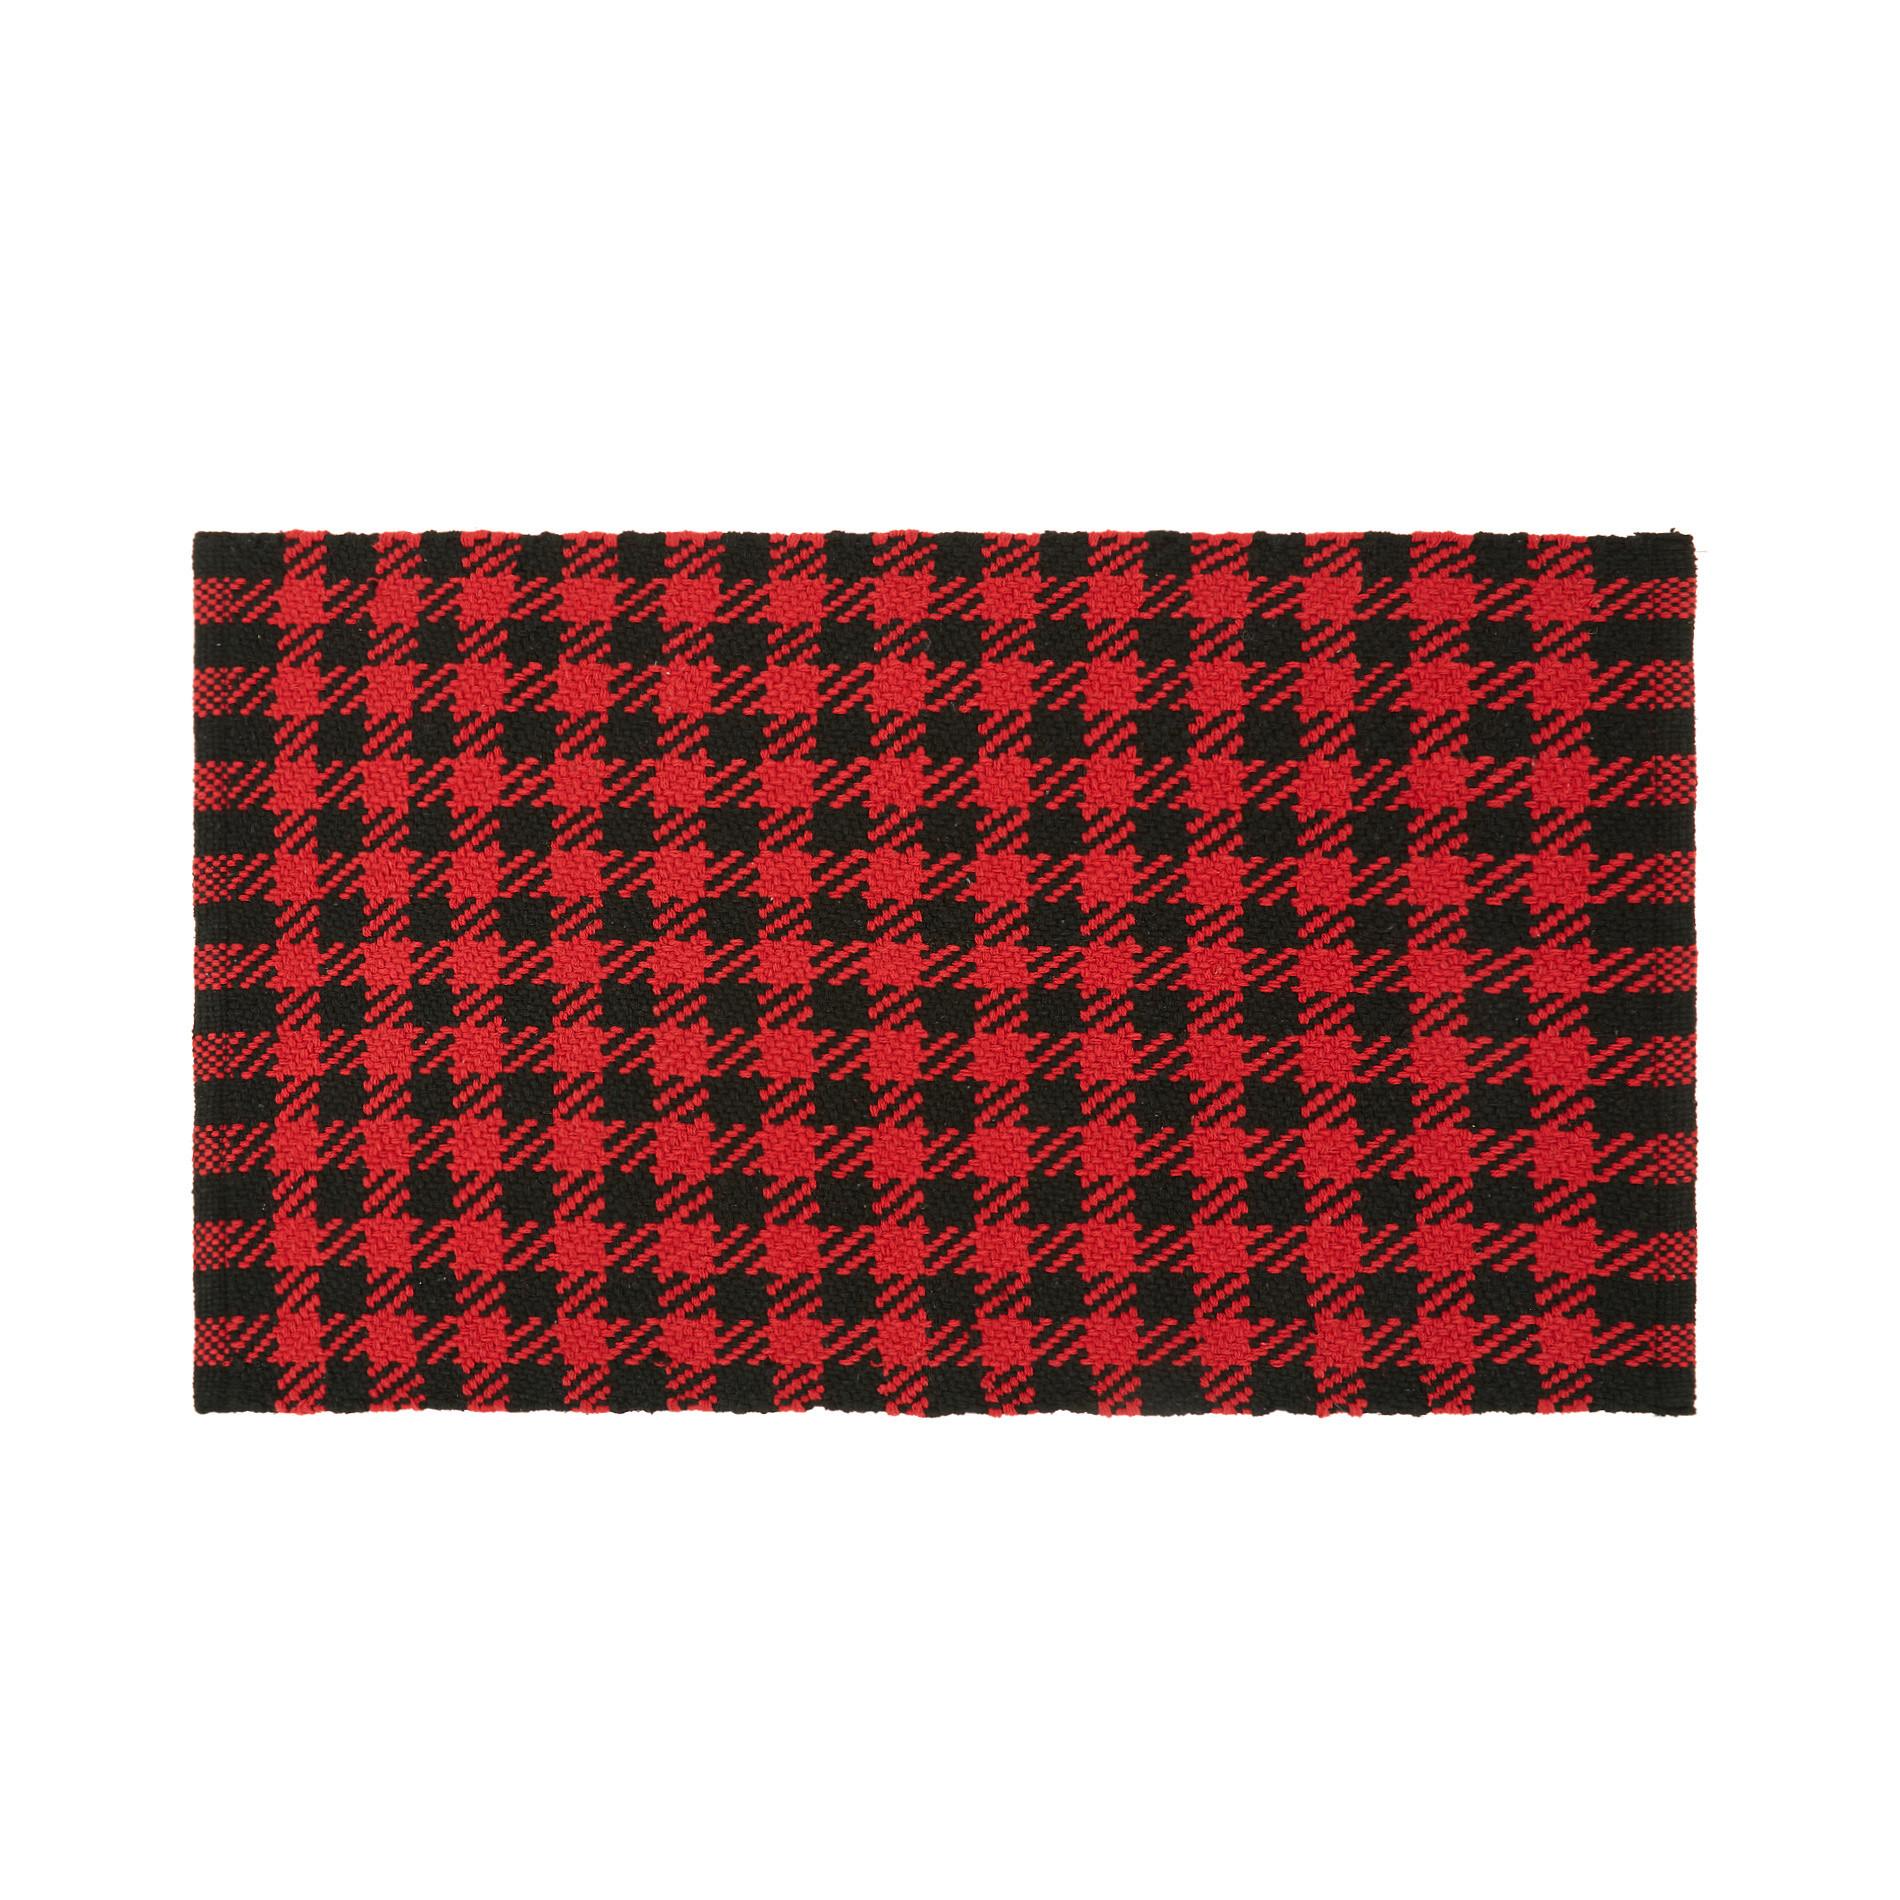 Tappeto tessuto motivo a quadri, Rosso, large image number 0